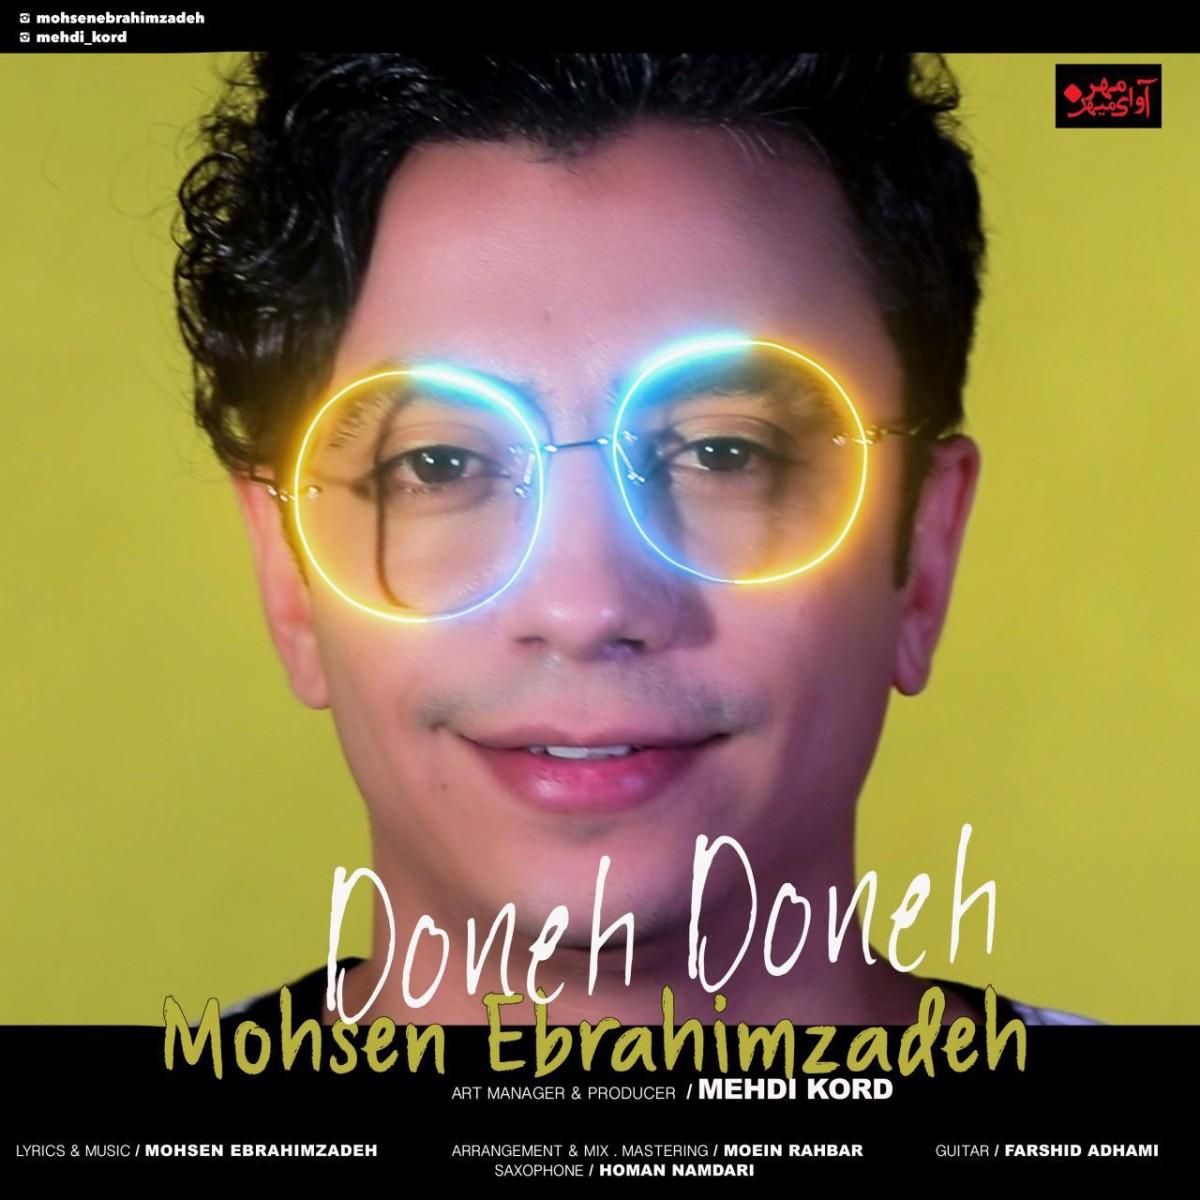 نامبر وان موزیک | دانلود آهنگ جدید Mohsen-Ebrahimzadeh-Doneh-Doneh